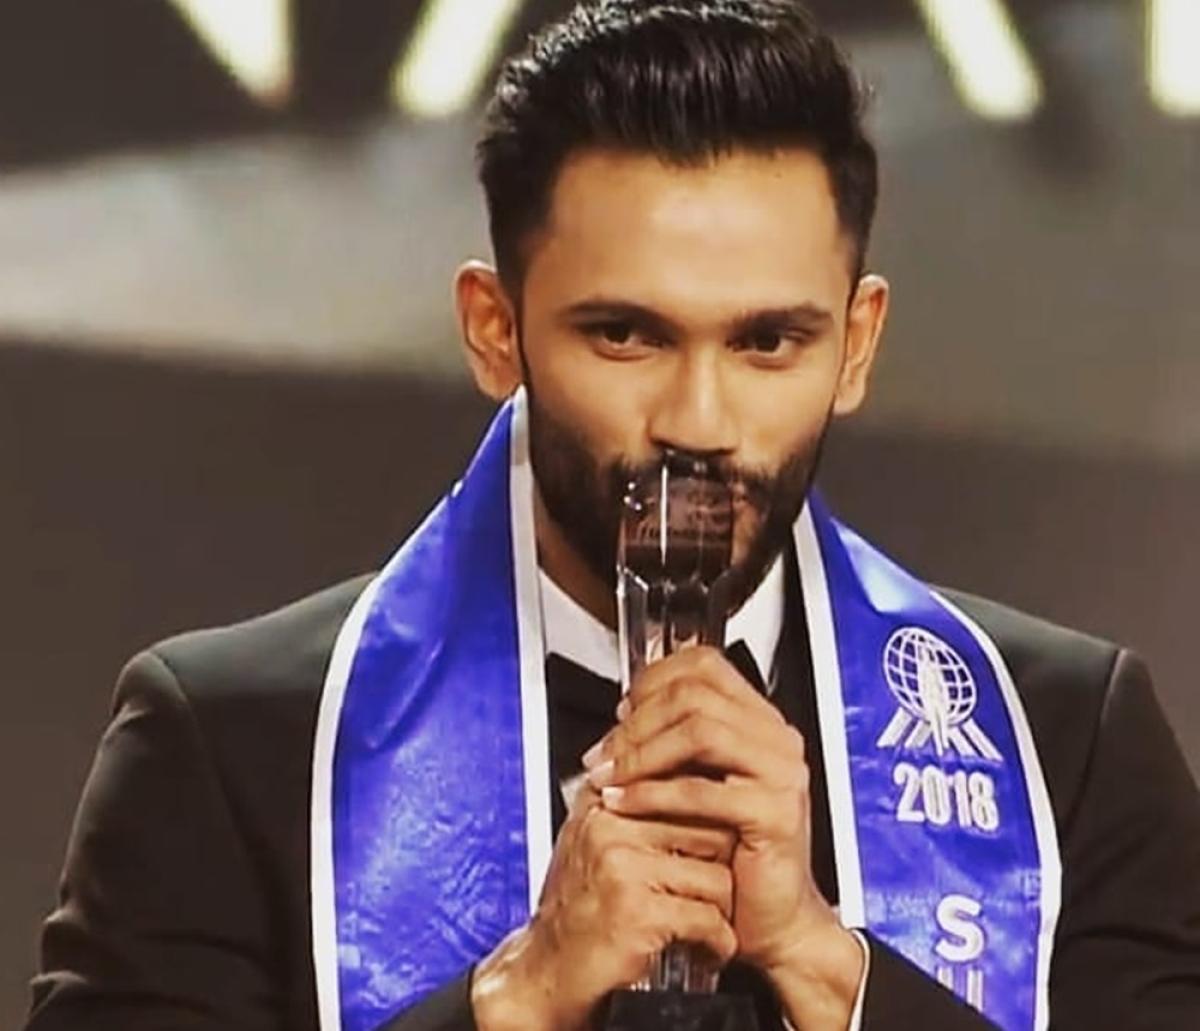 In a first, India's Prathamesh Maulingkar wins Mister Supranational 2018